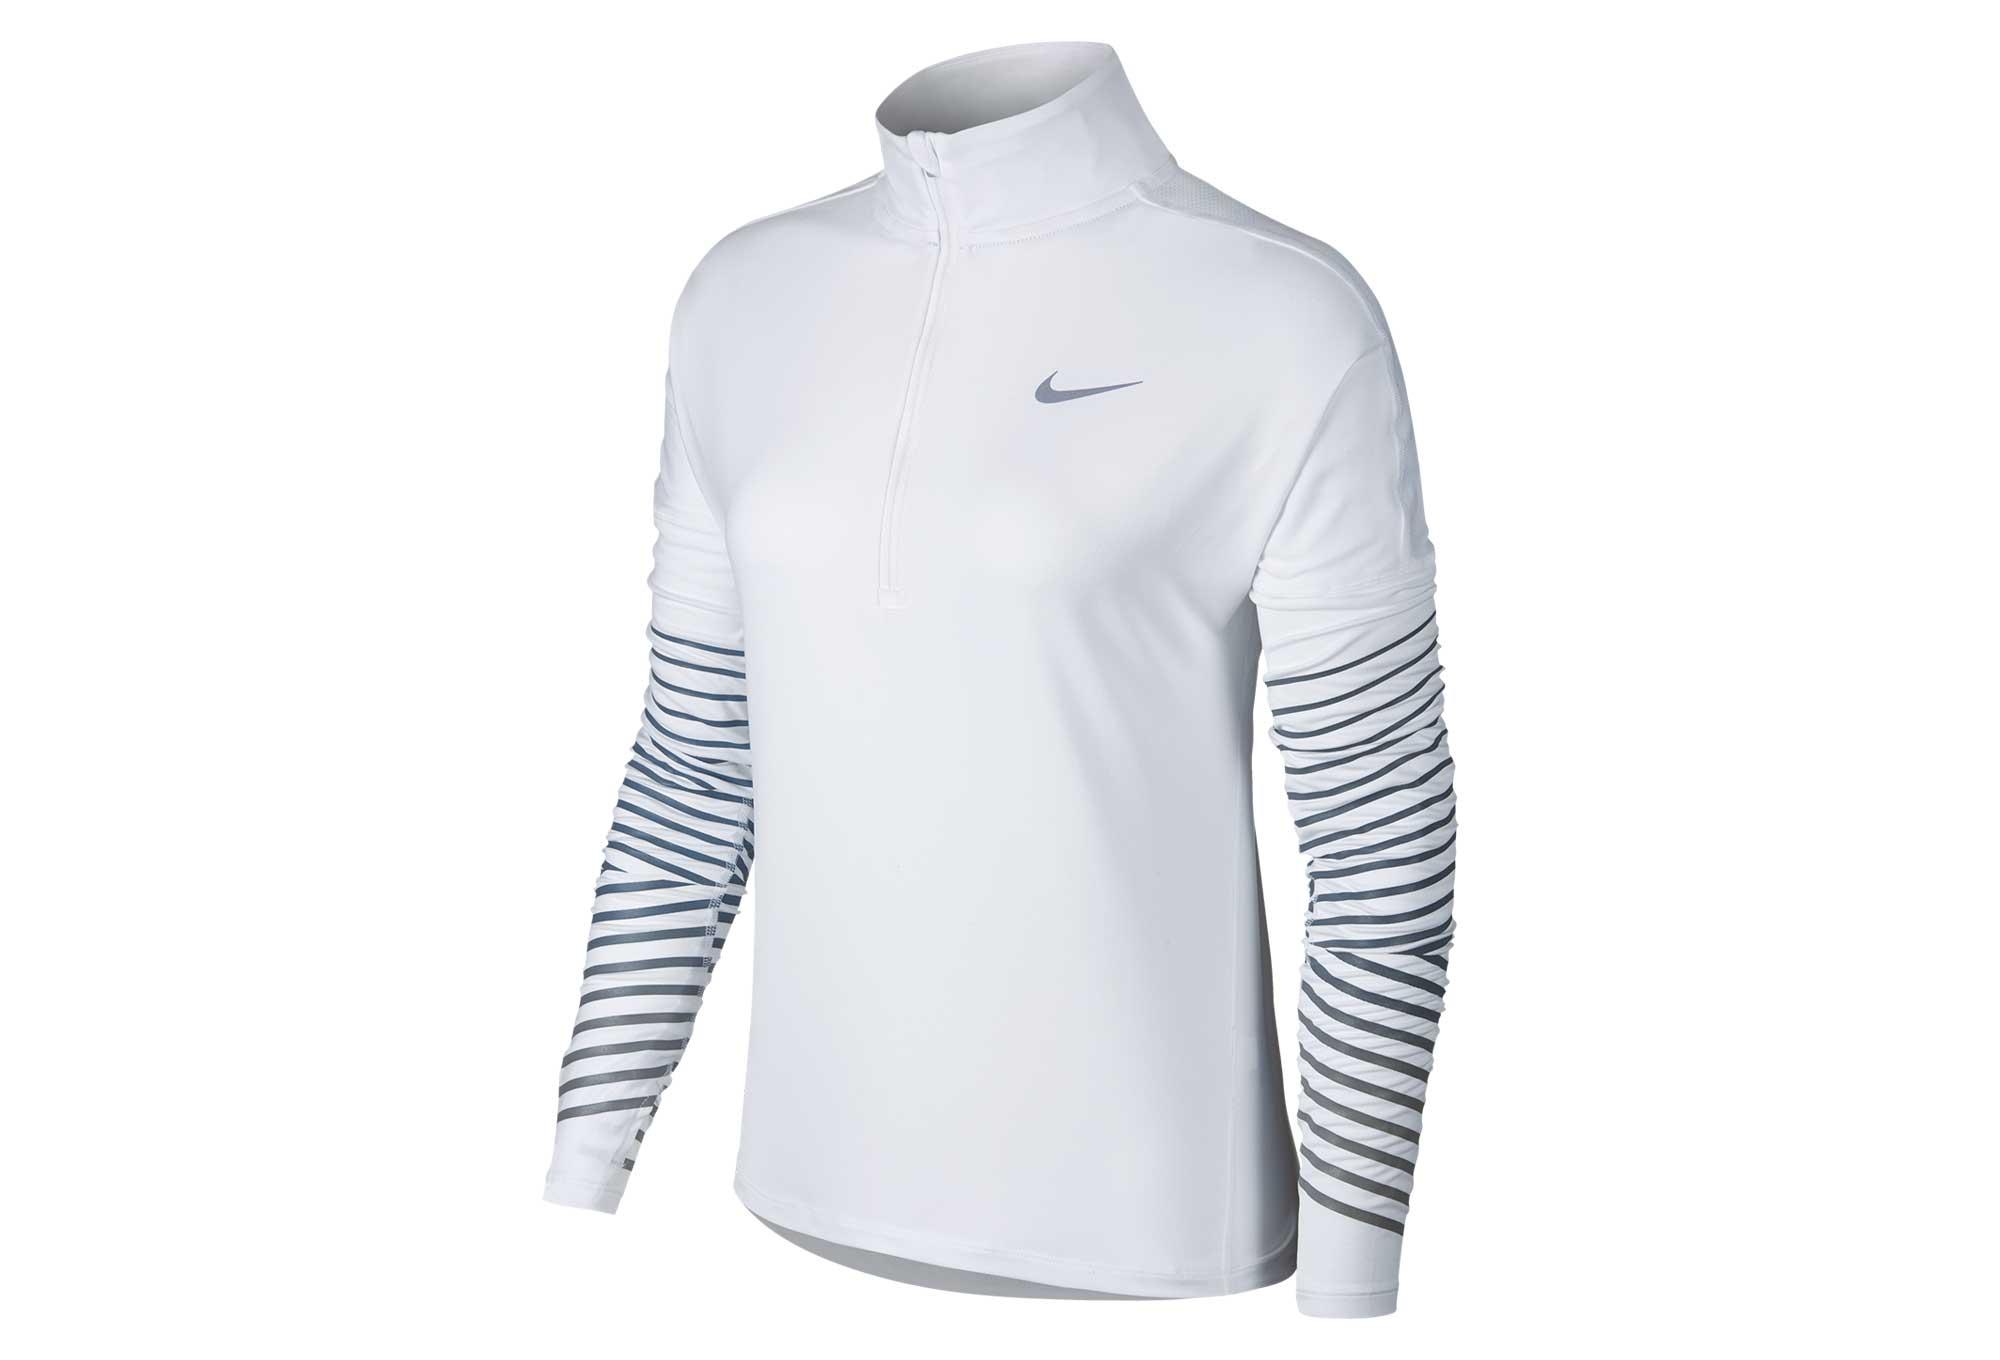 Haut Manches Longues Femme Nike Dry Element Flash Blanc  55b1398031d